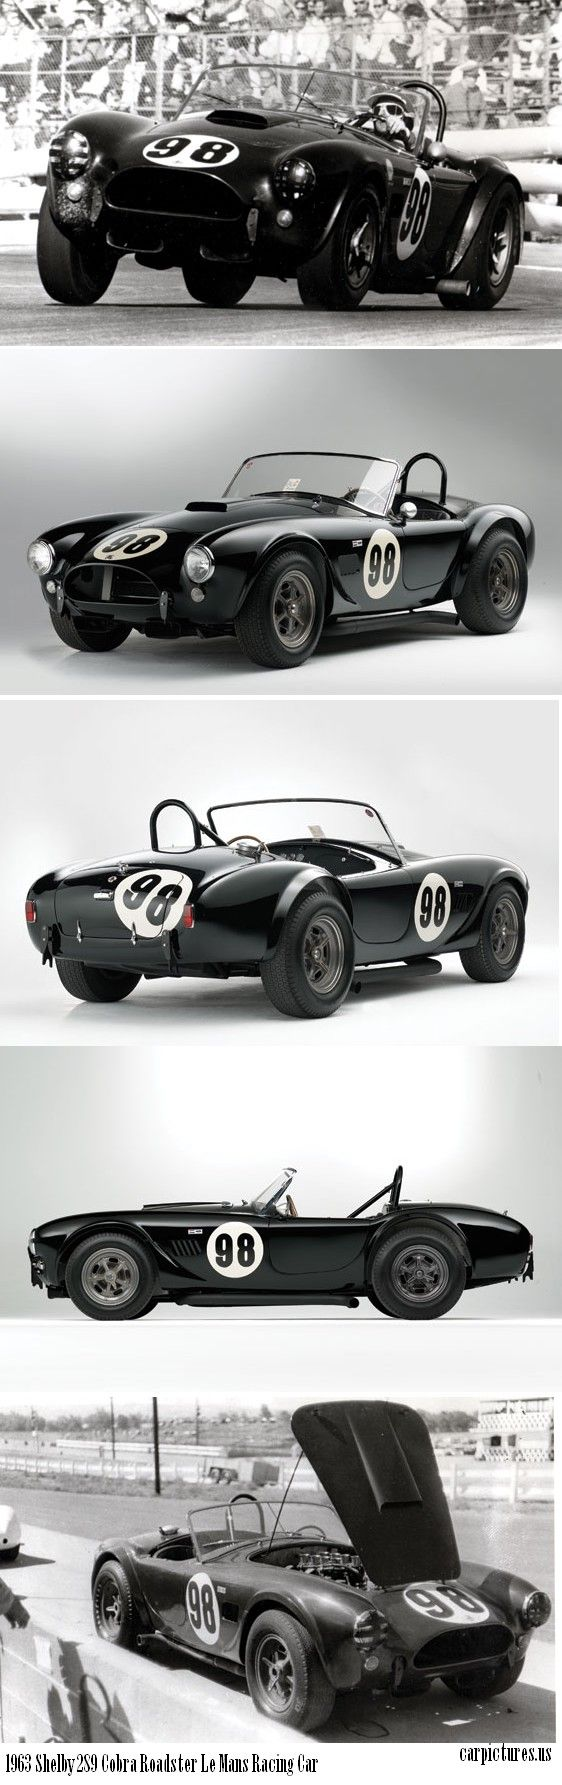 1963 Shelby 289 Cobra Roadster Le Mans Racing Car ✏✏✏✏✏✏✏✏✏✏✏✏✏✏✏✏ AUTRES VEHICULES - OTHER VEHICLES   ☞ https://fr.pinterest.com/barbierjeanf/pin-index-voitures-v%C3%A9hicules/ ══════════════════════  BIJOUX  ☞ https://www.facebook.com/media/set/?set=a.1351591571533839&type=1&l=bb0129771f ✏✏✏✏✏✏✏✏✏✏✏✏✏✏✏✏